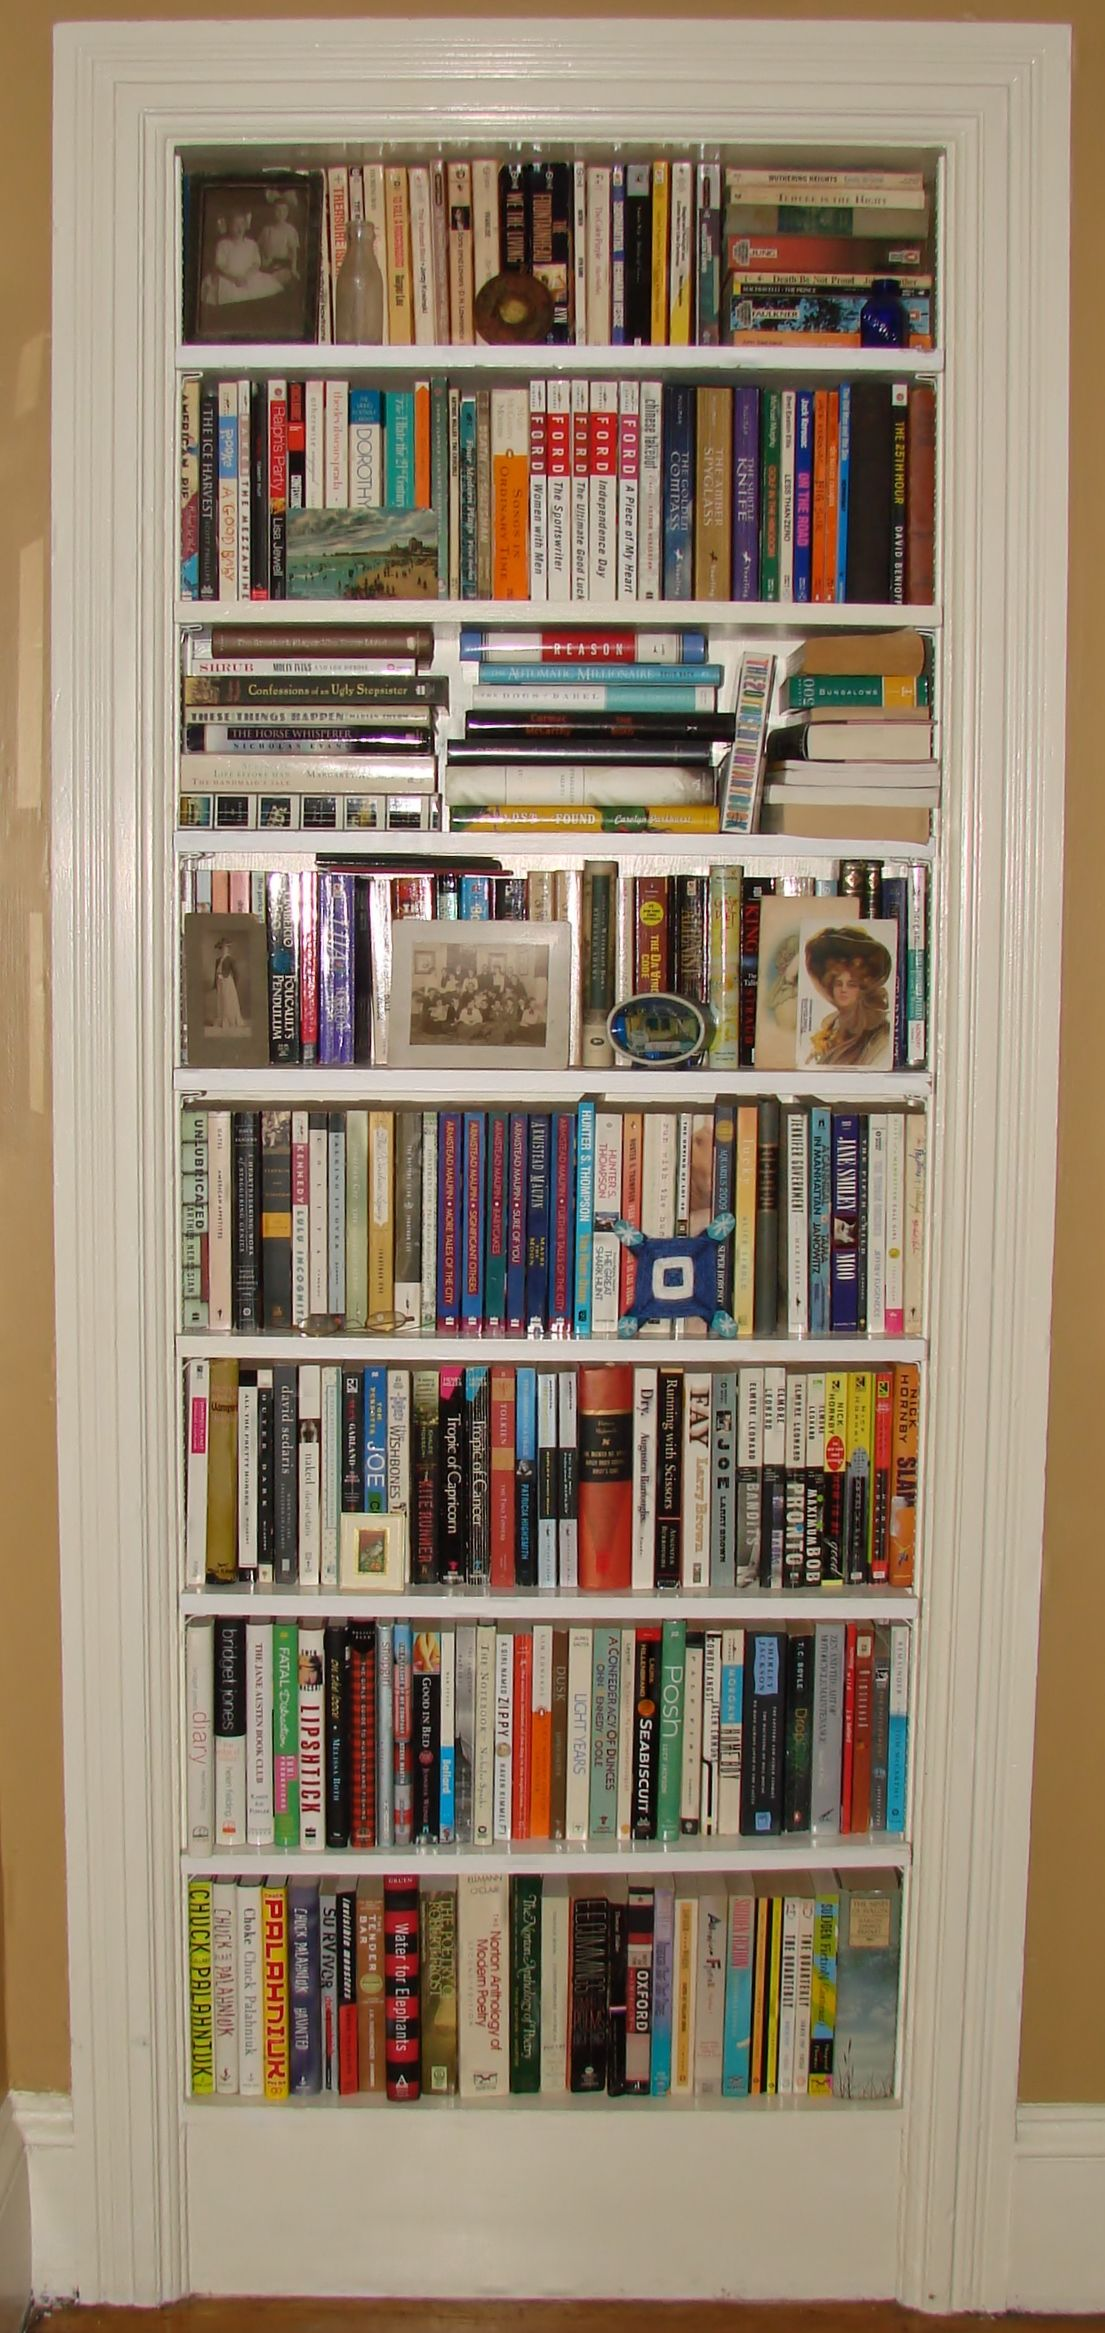 Unused Doorway Enclosed And Converted To Bookshelf